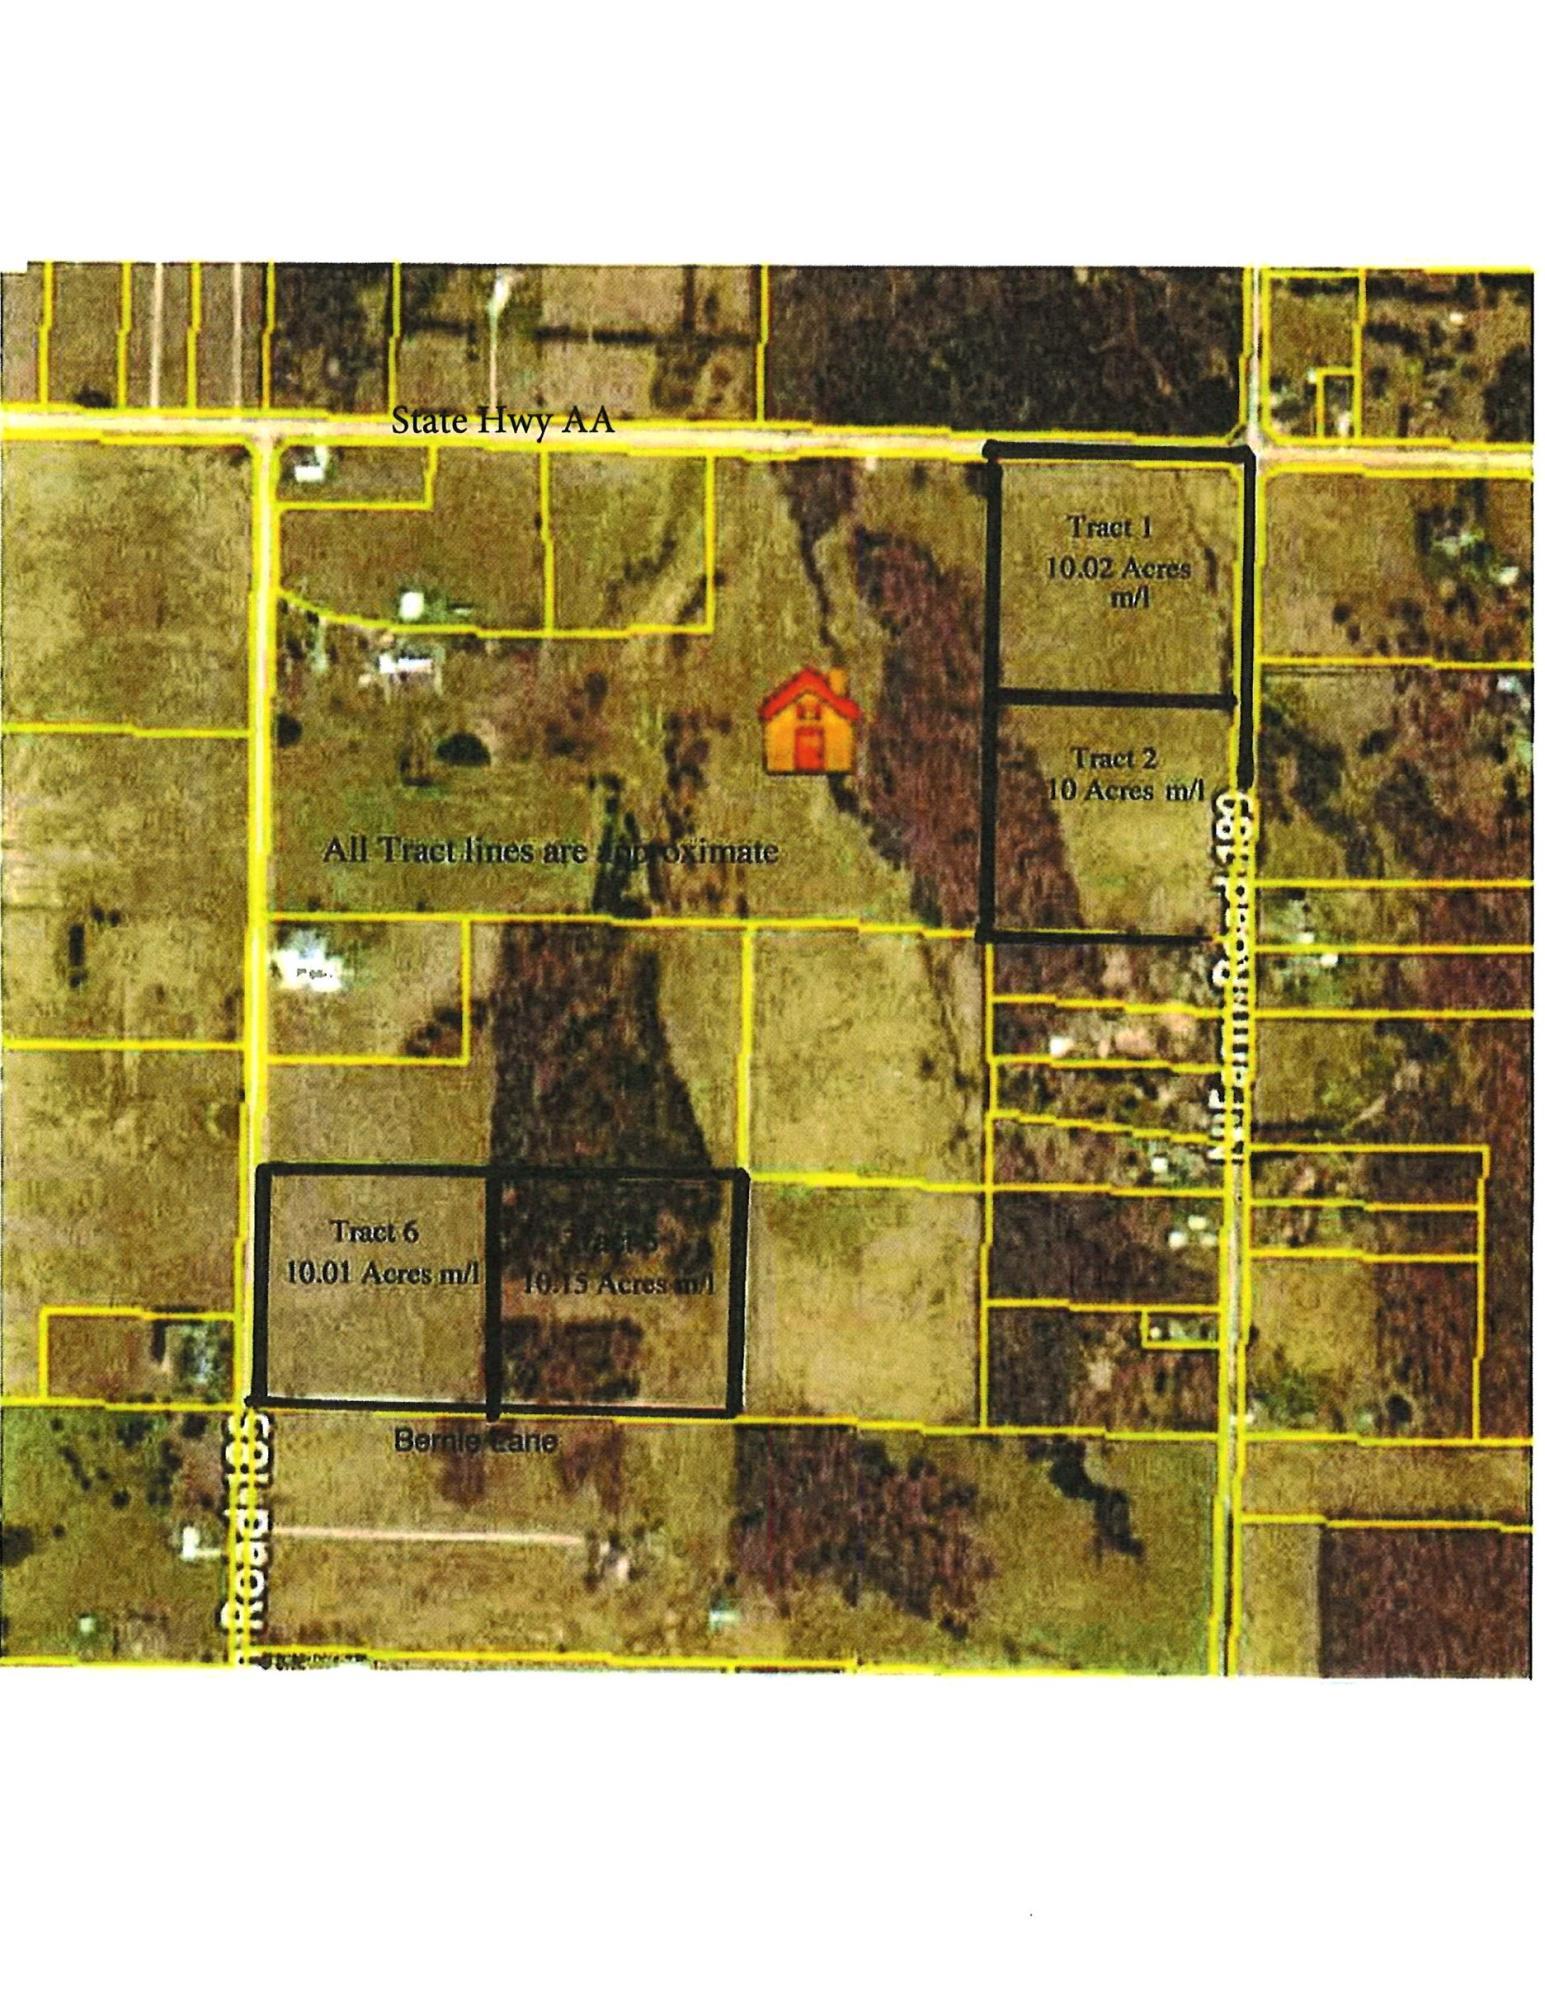 T 2 North Farm Road 189 Springfield, MO 65803